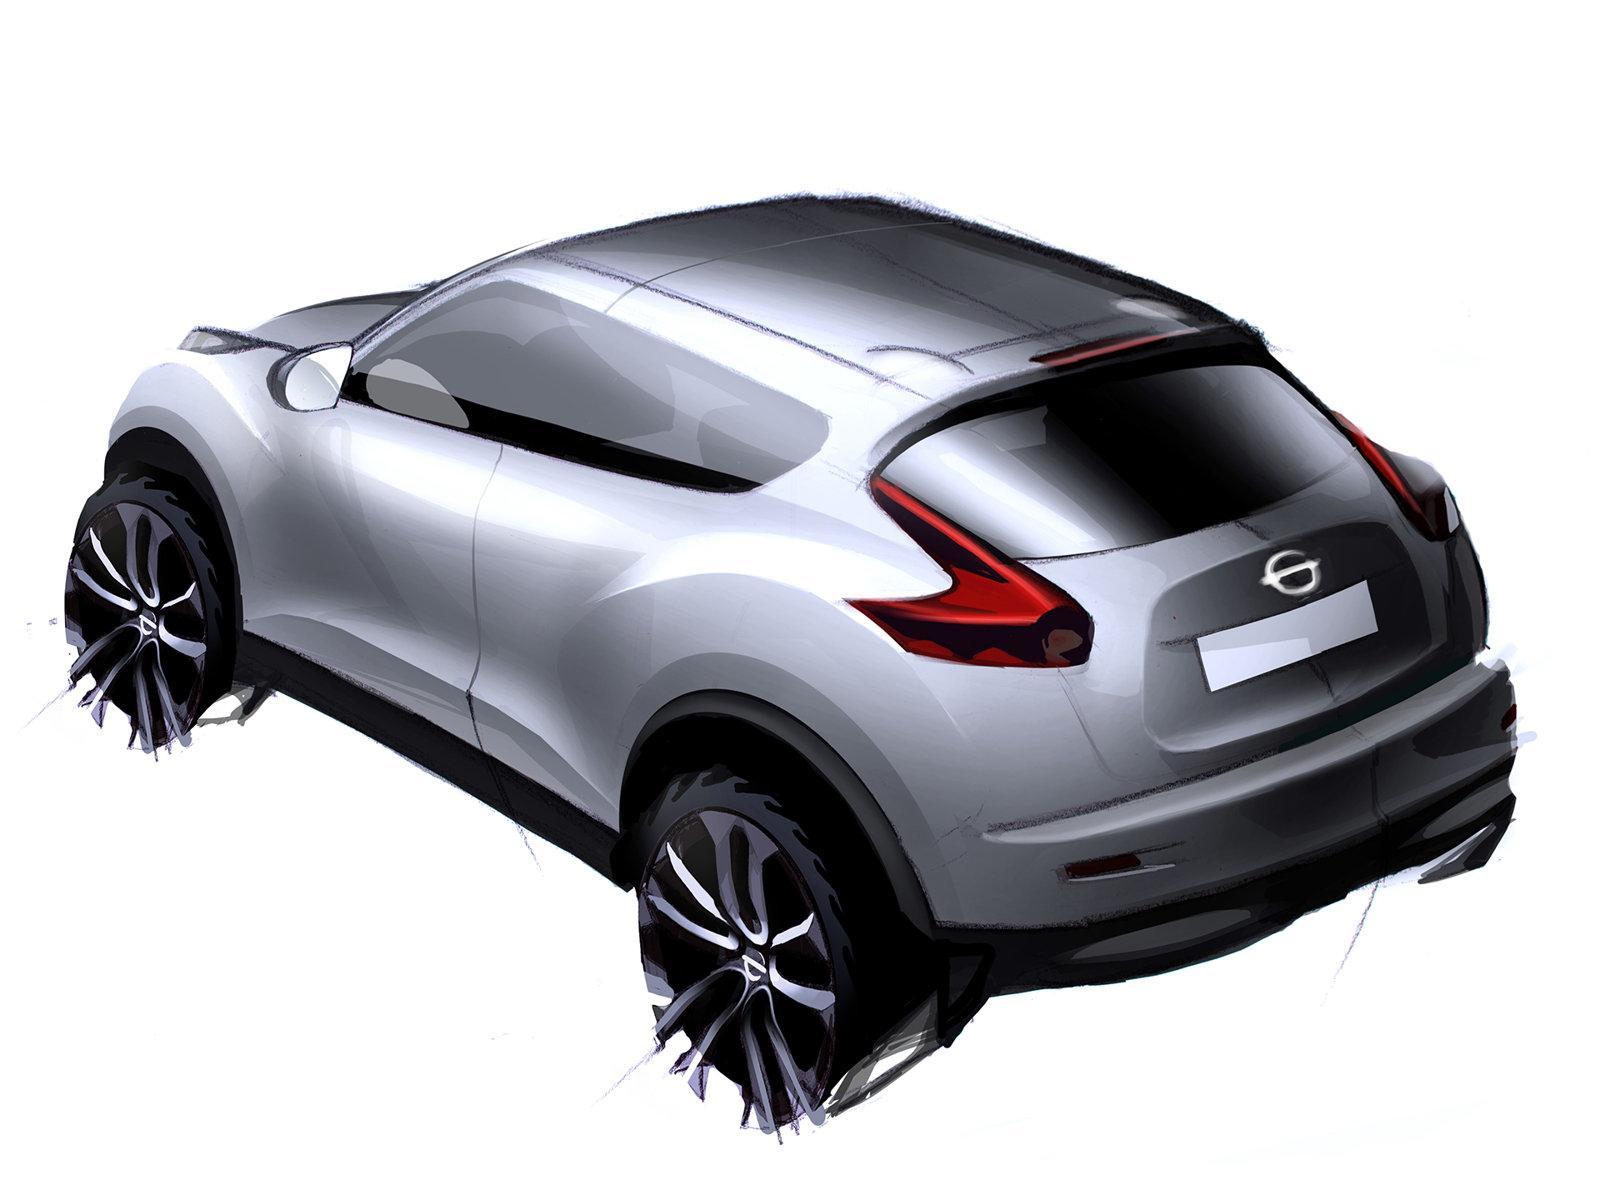 Latest car expensive: Photo Gallery: 2010 Nissan Juke